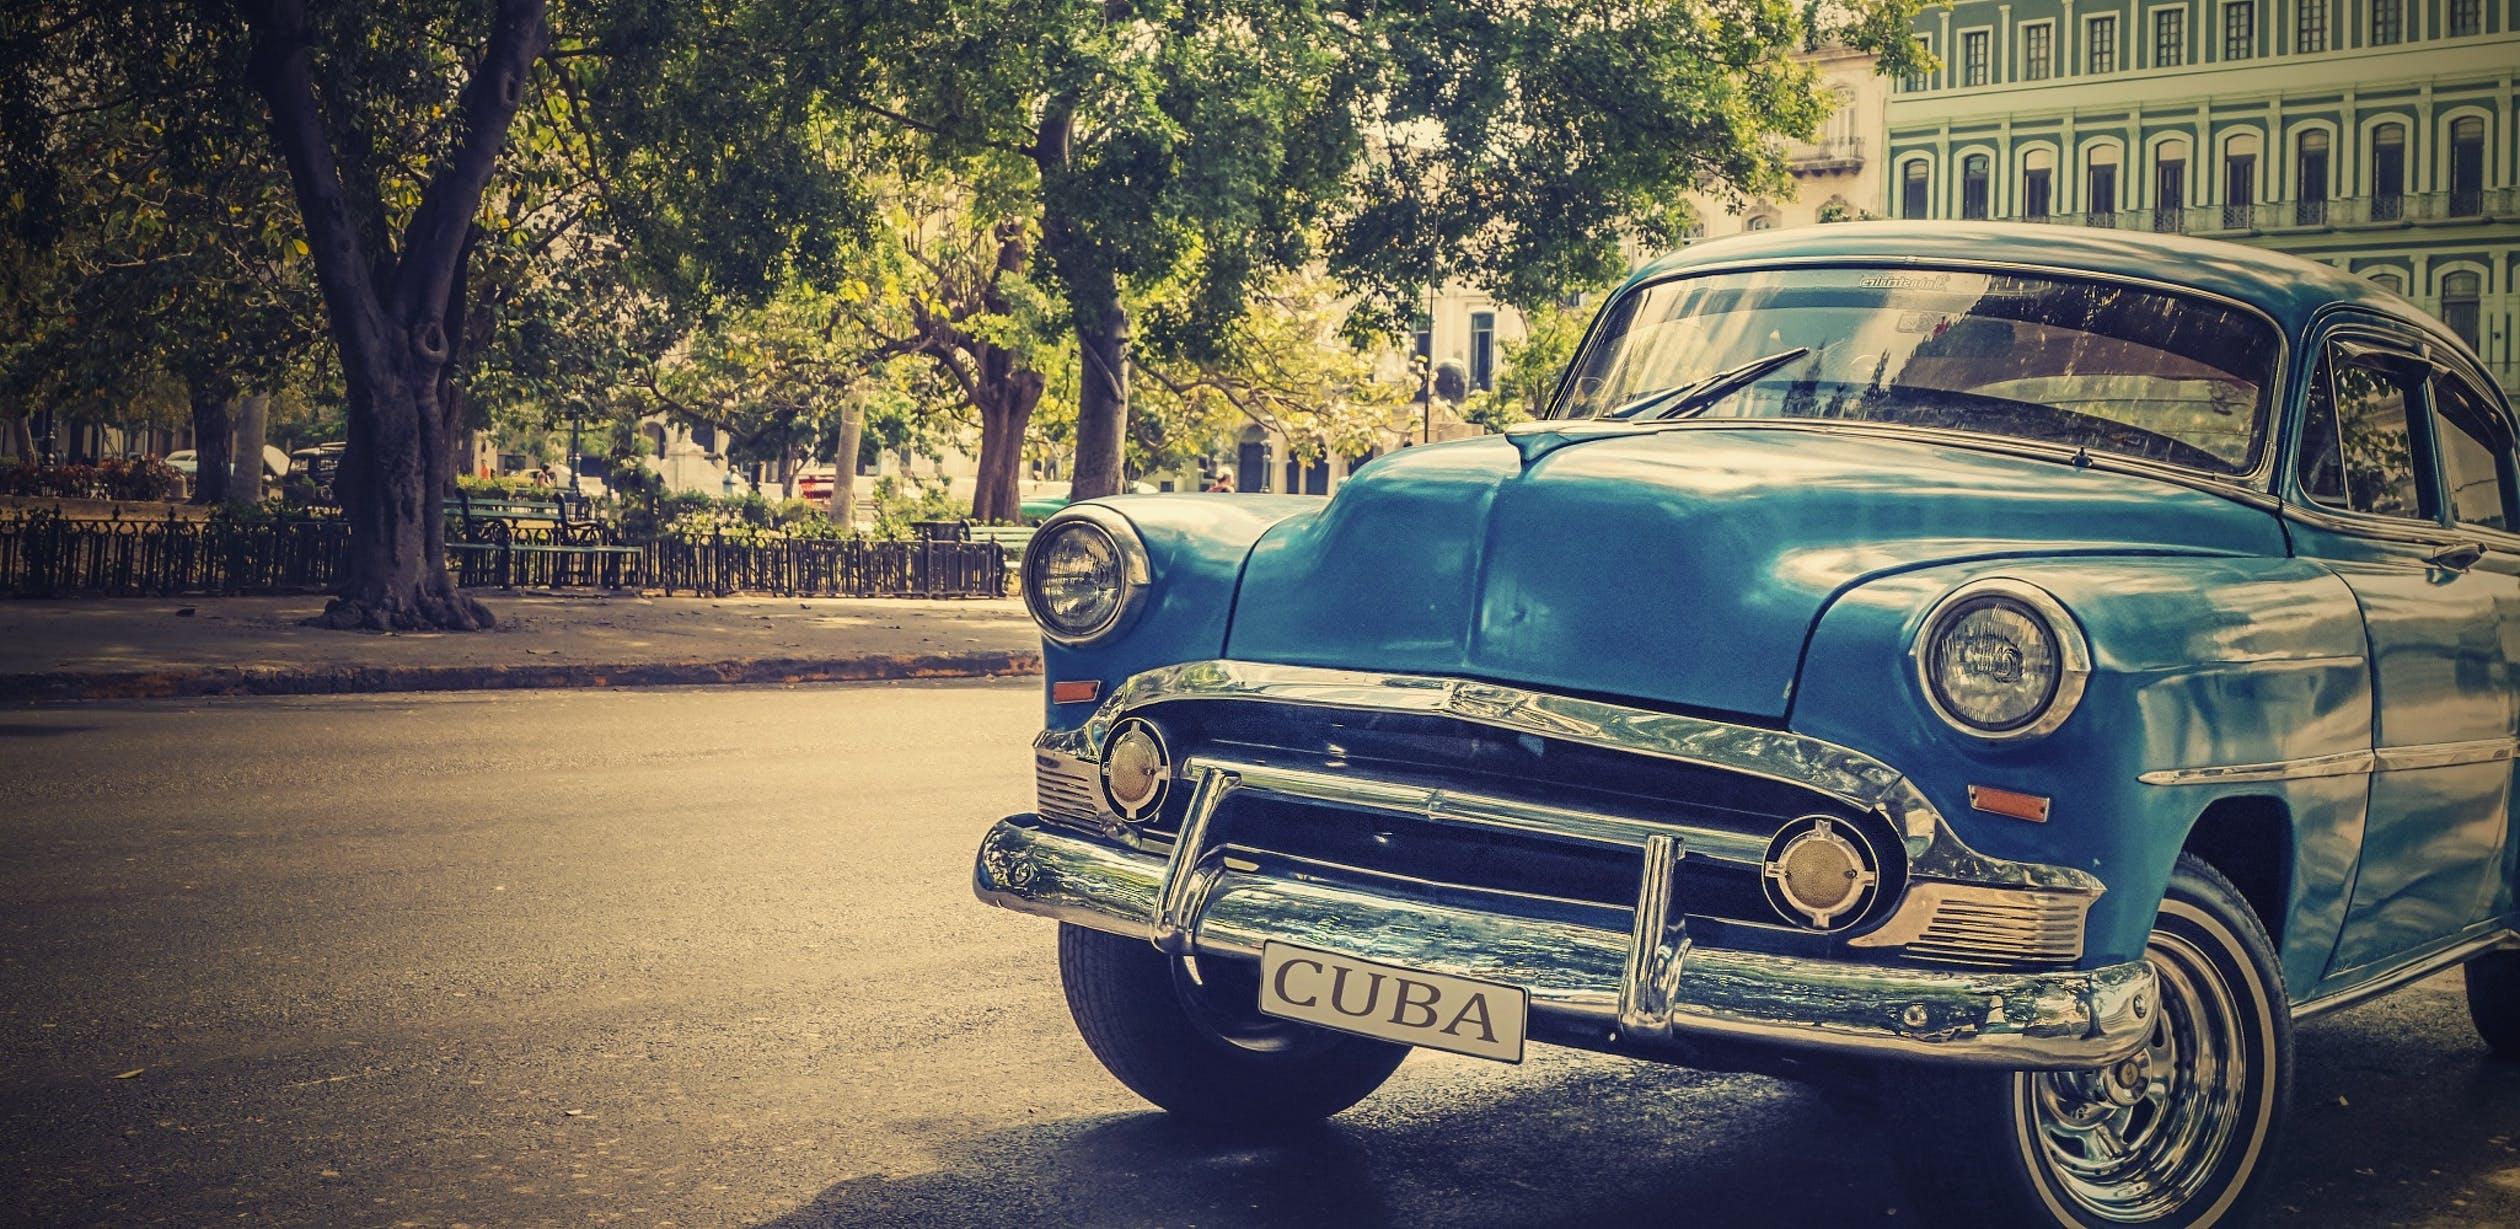 Cuba opportunities